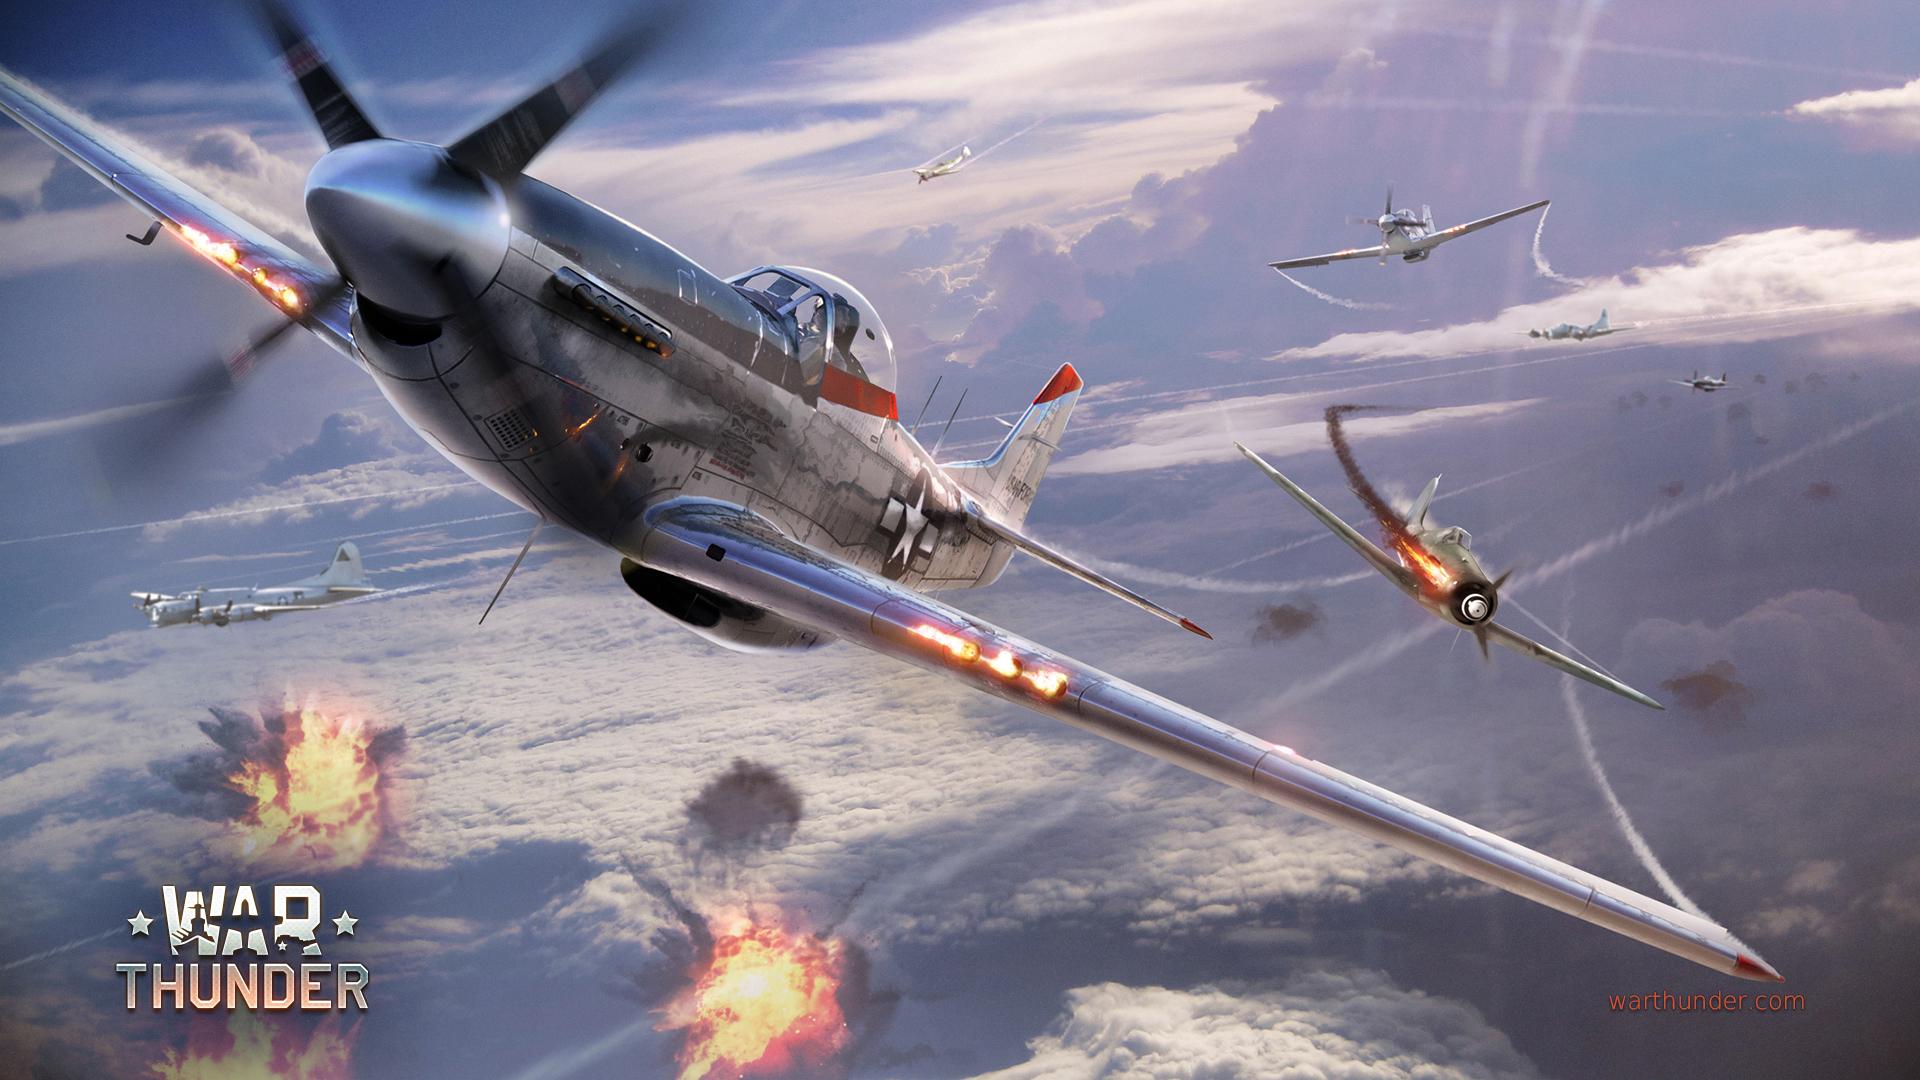 Sky Duels 9 P 51 vs FW series Warthunder 1920x1080